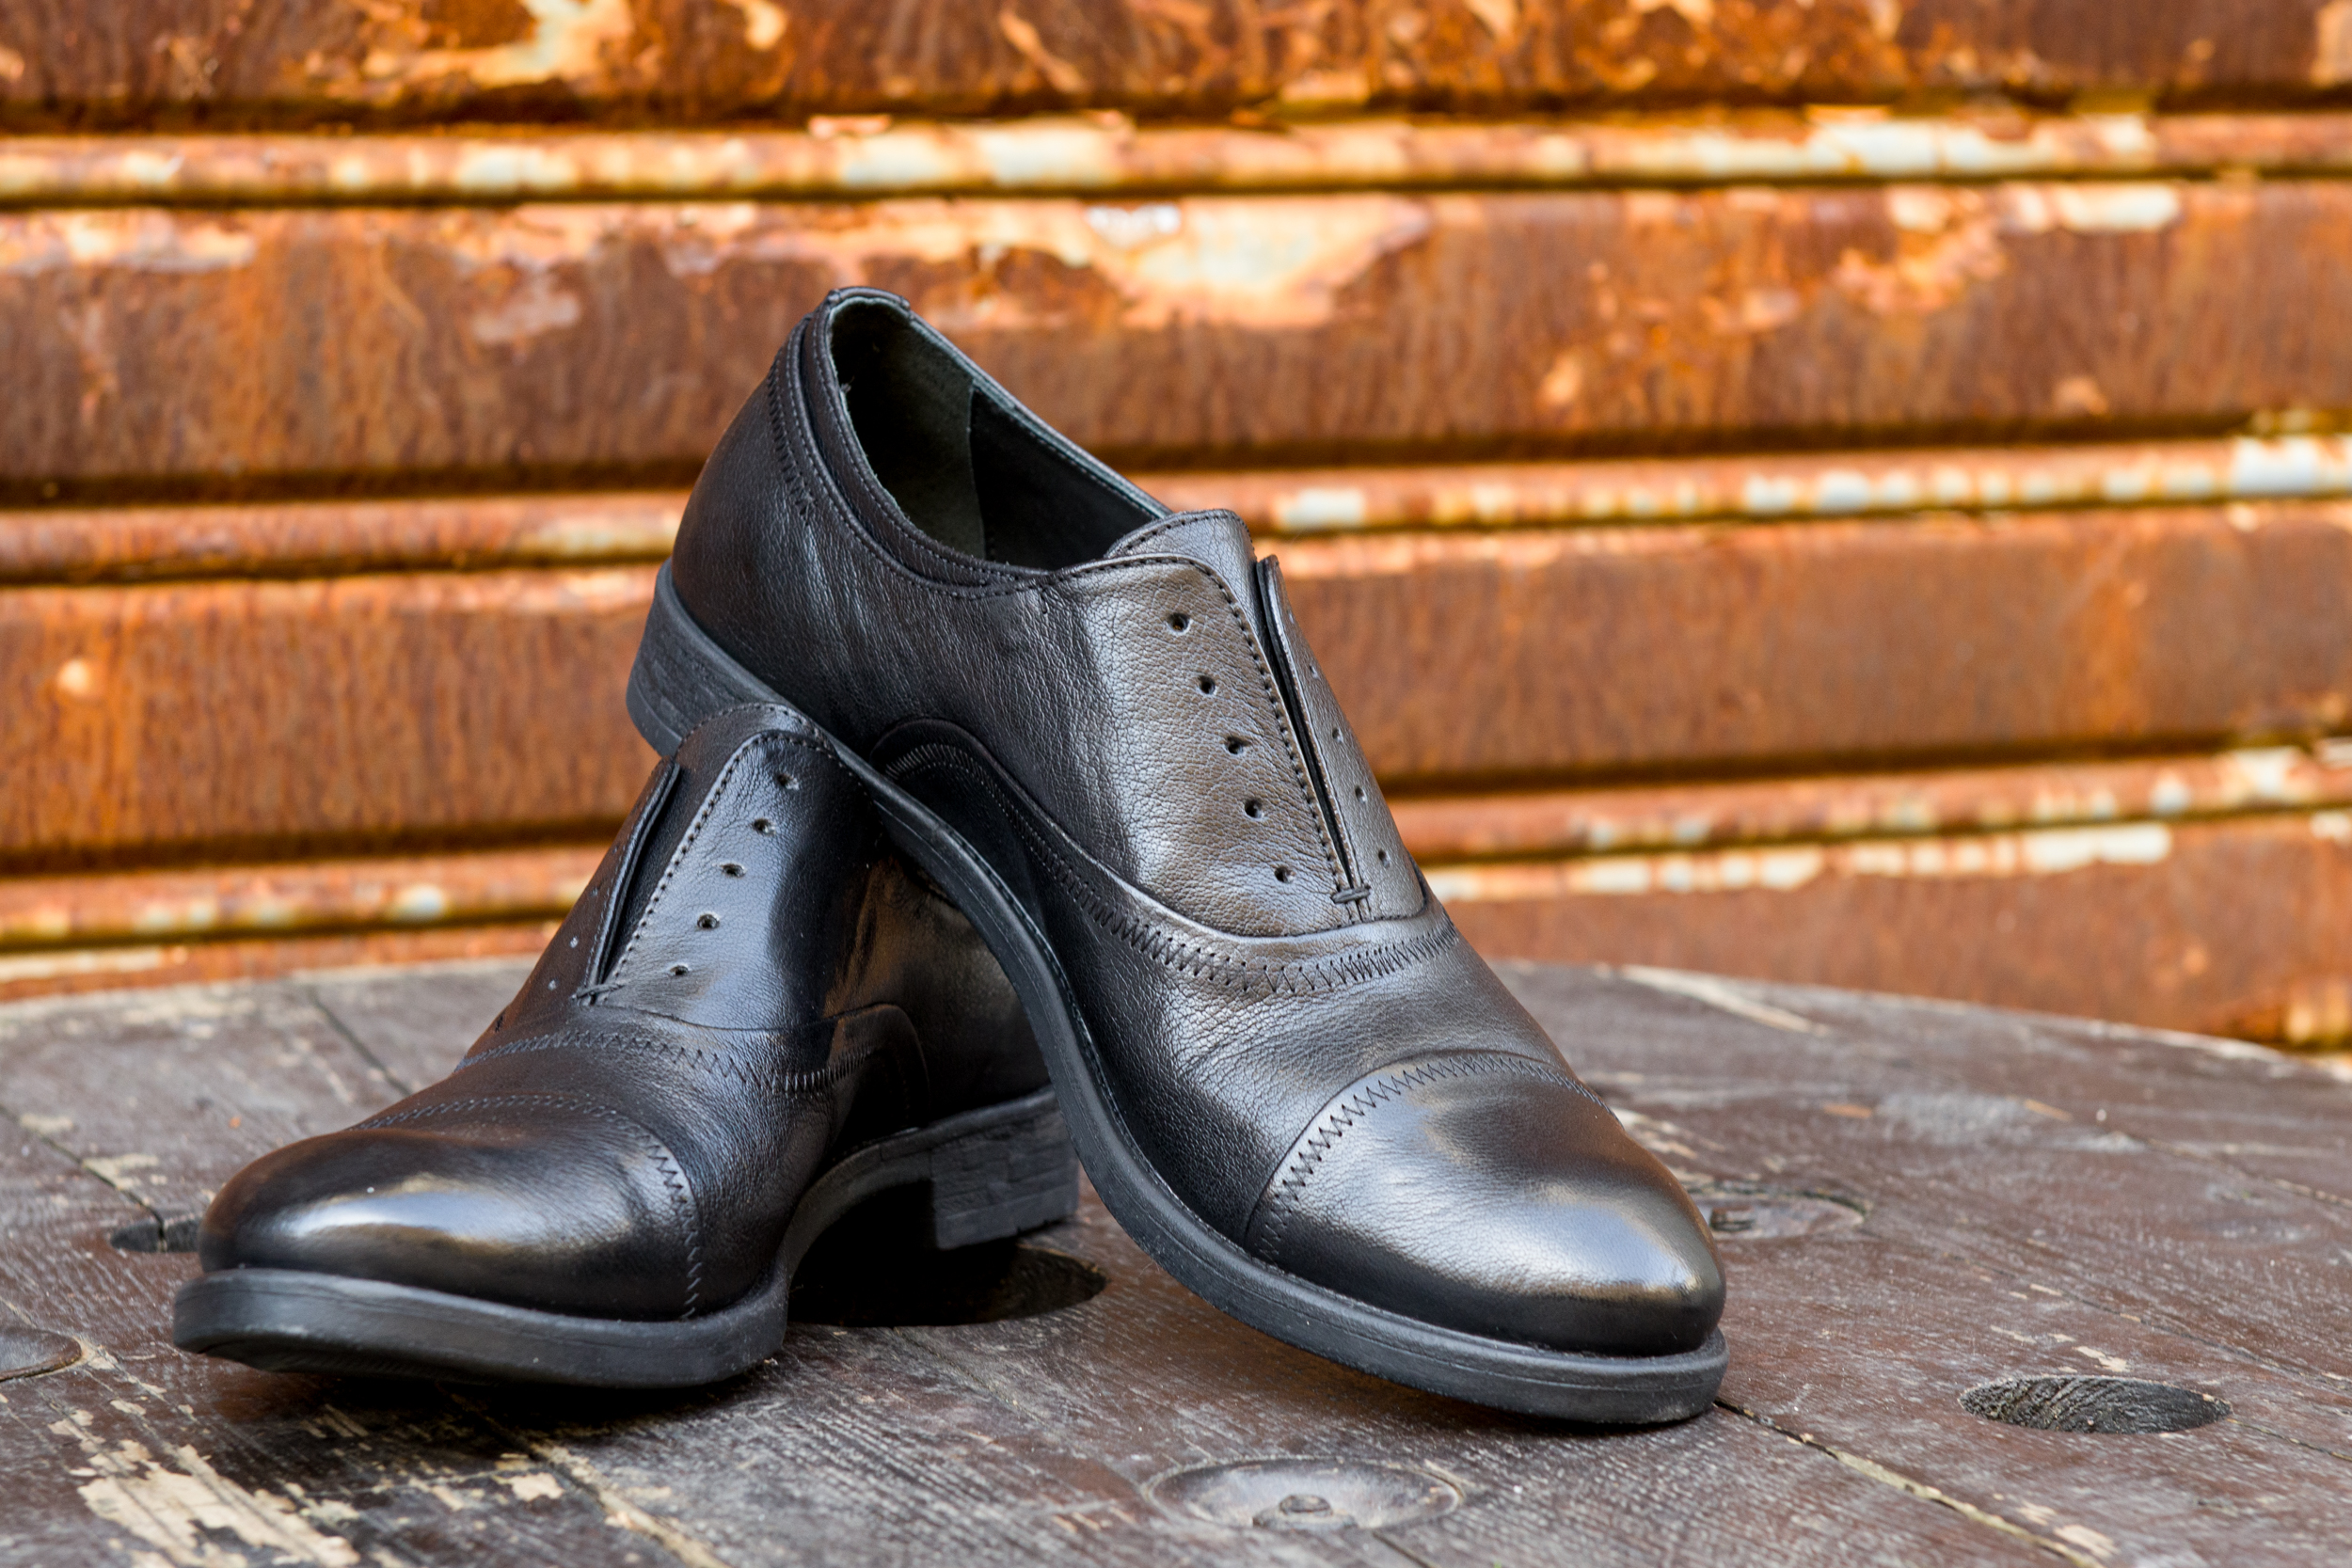 scarpe-francesine-pawelks-moda-uomo-calzature